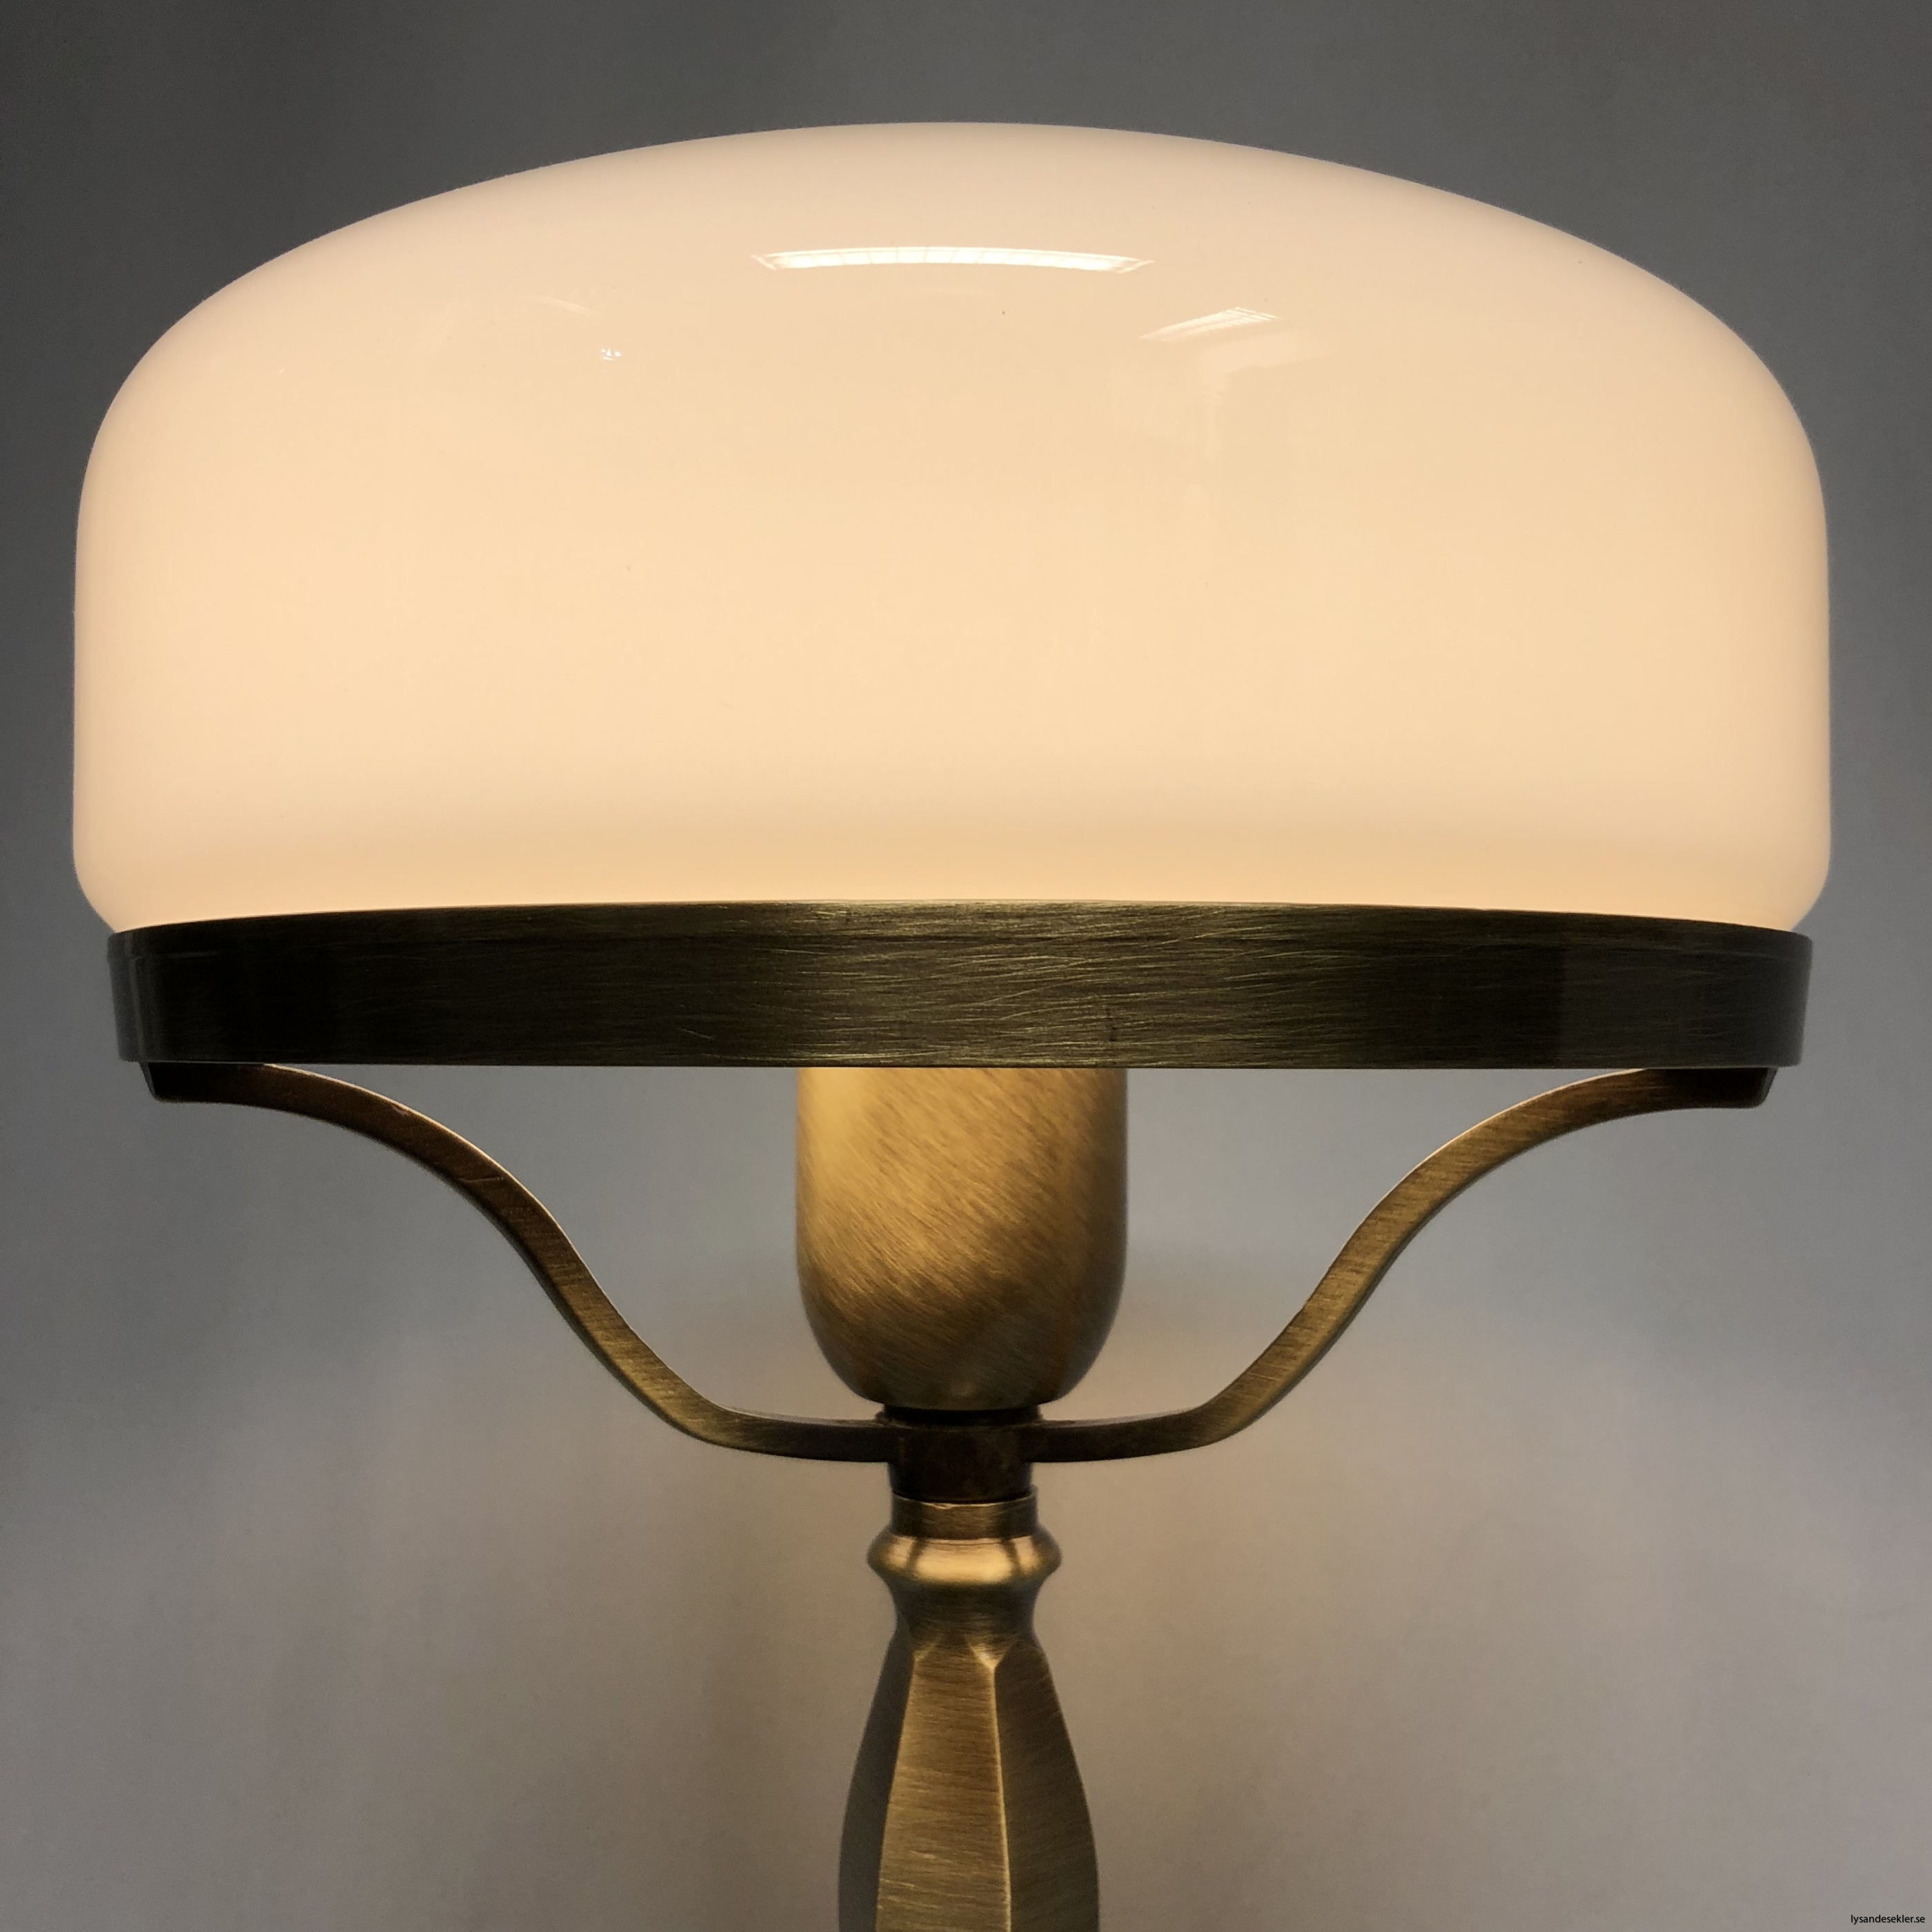 strindbergslampa strindbergslampor strindberg lampa skärm kupa strindbergsskärm strindbergskupa14